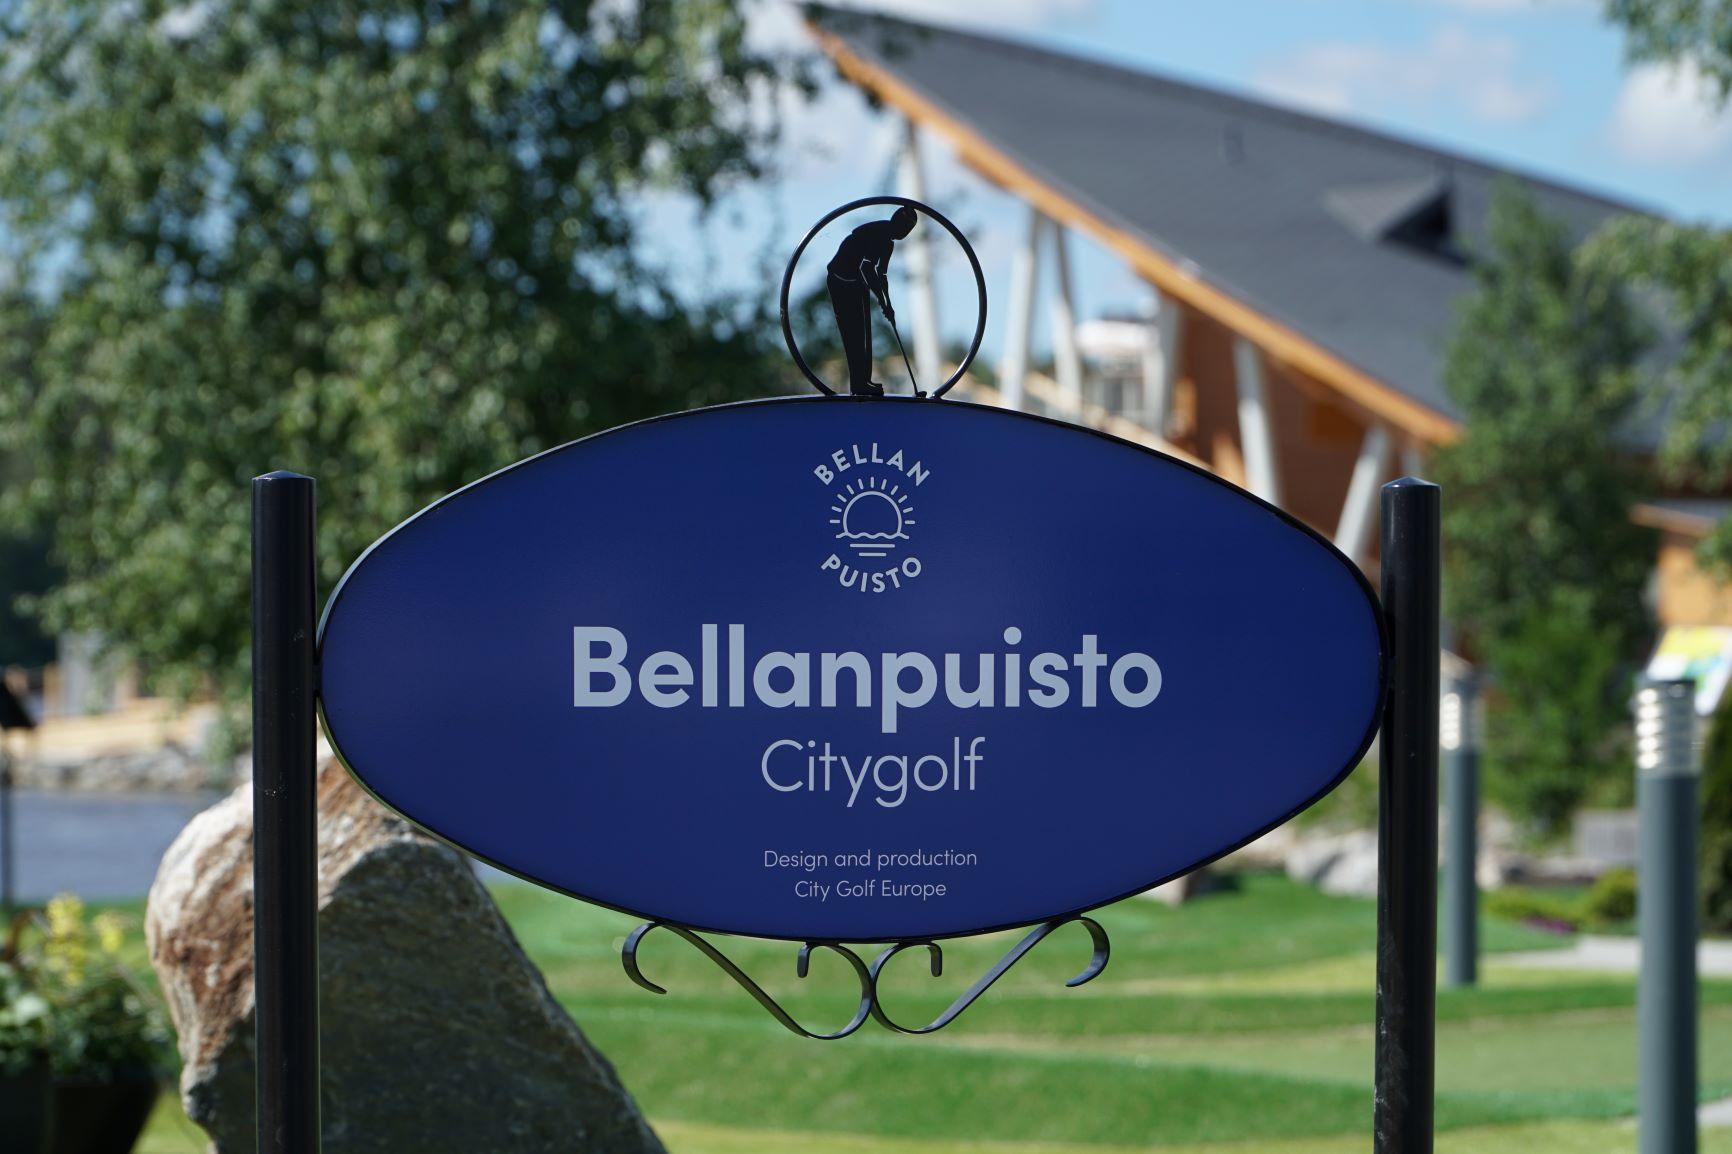 Bellanpuisto hosts World Adventure Golf Masters 2021